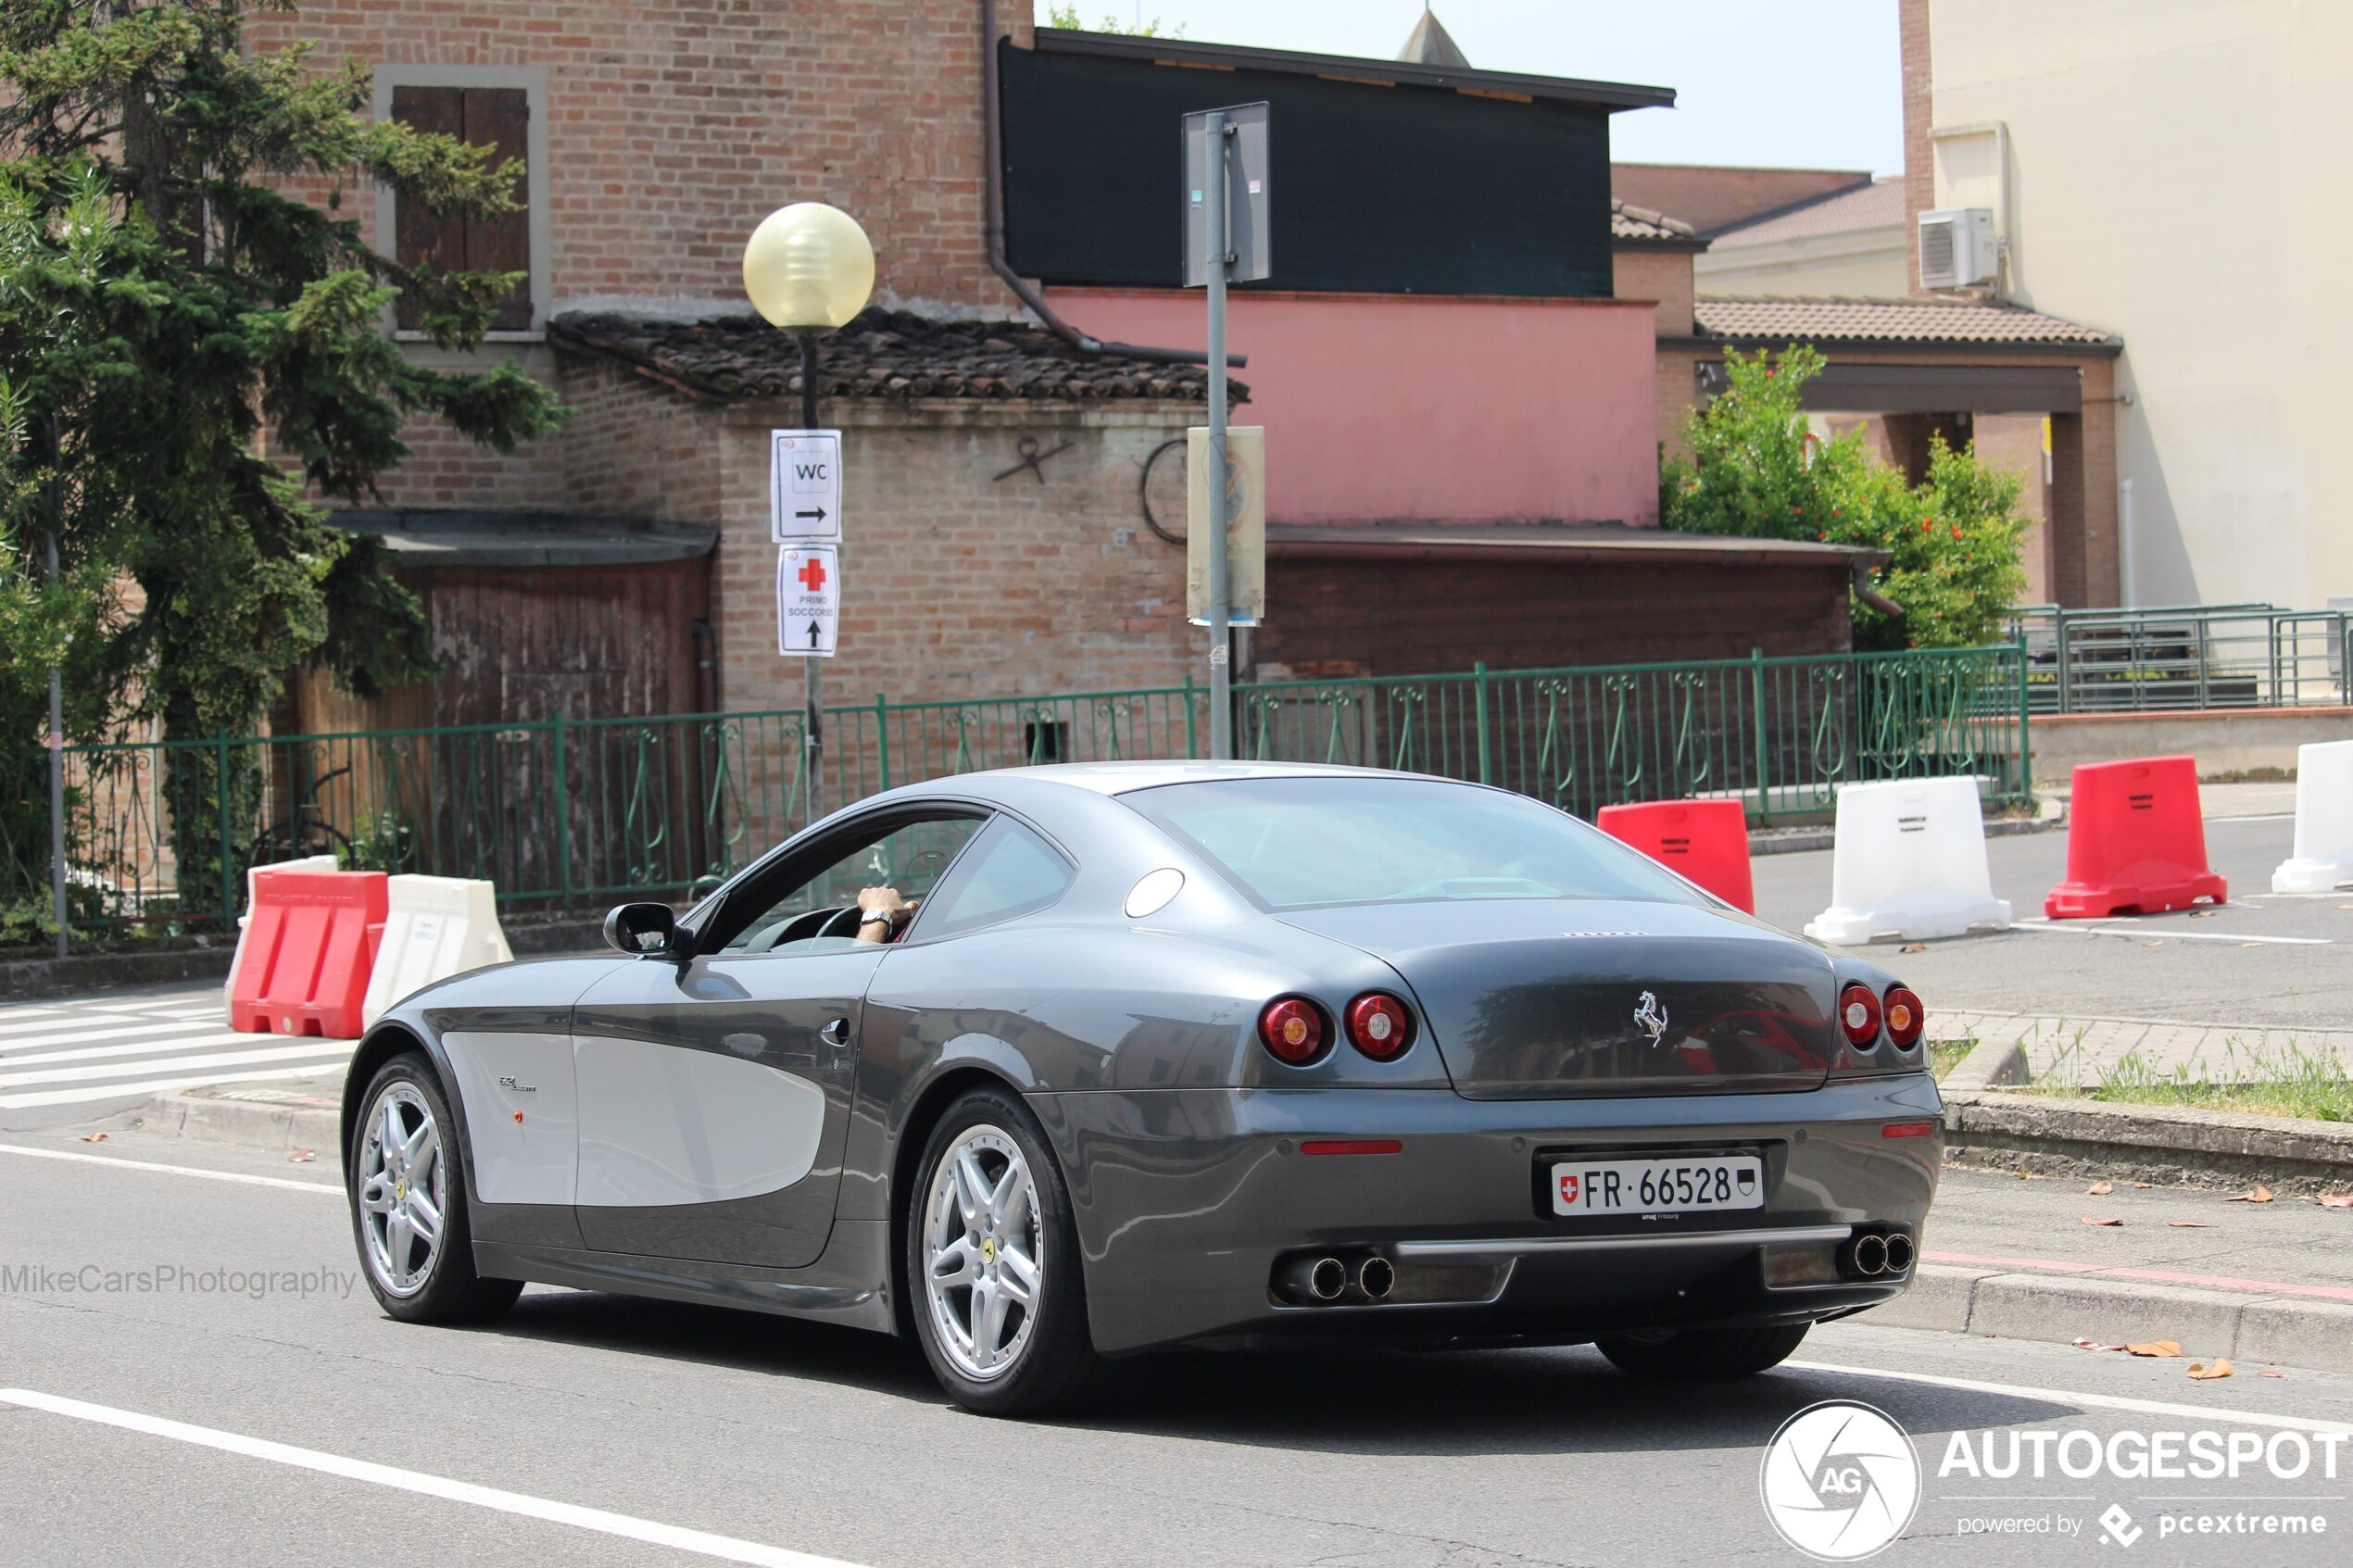 Ferrari 612 Scaglietti GP Berne Edition is een speciaaltje